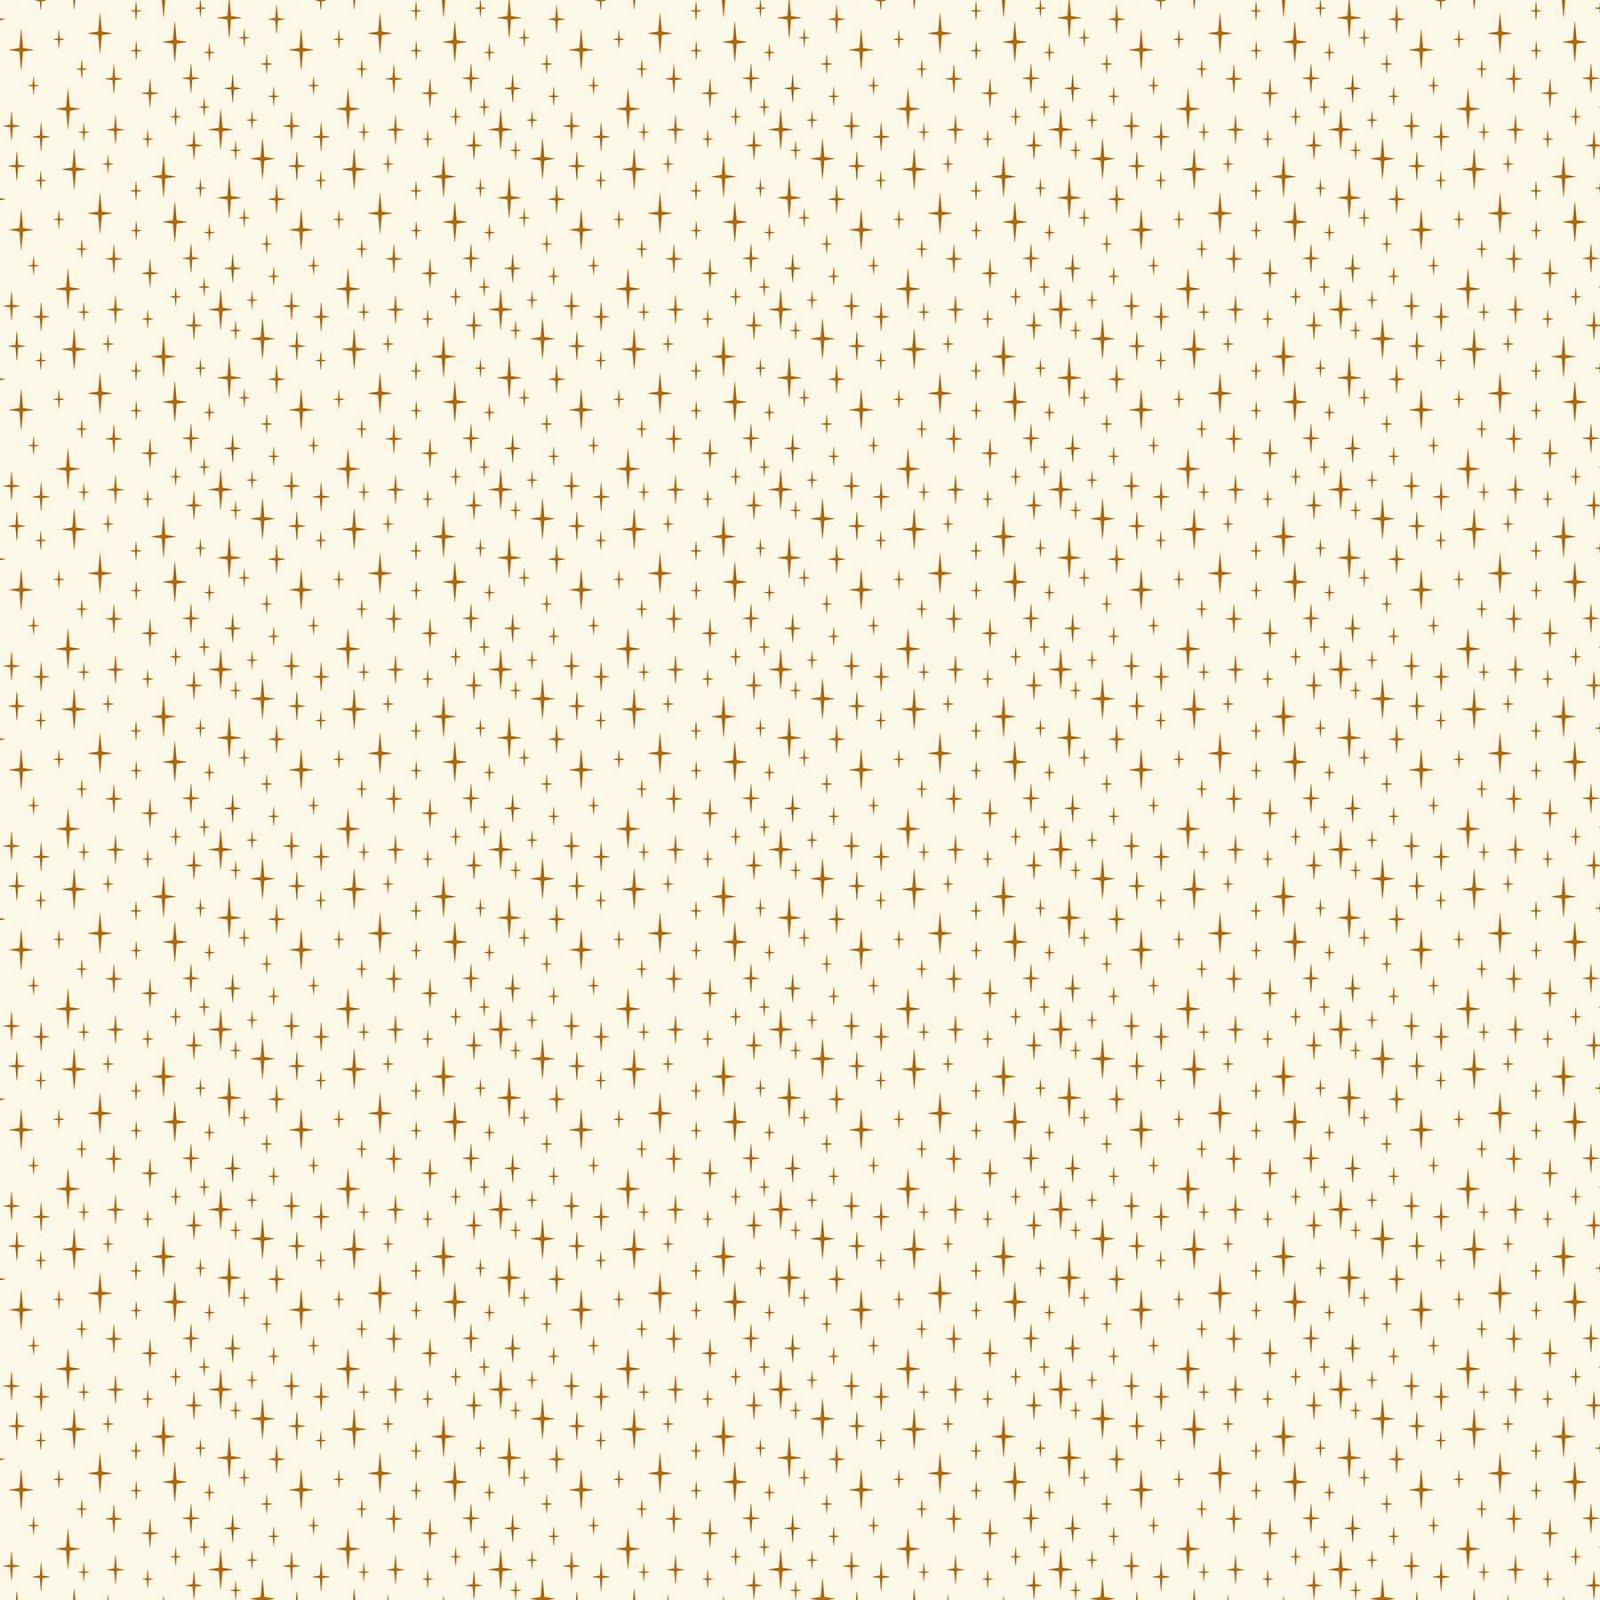 Butterscotch Starlight White